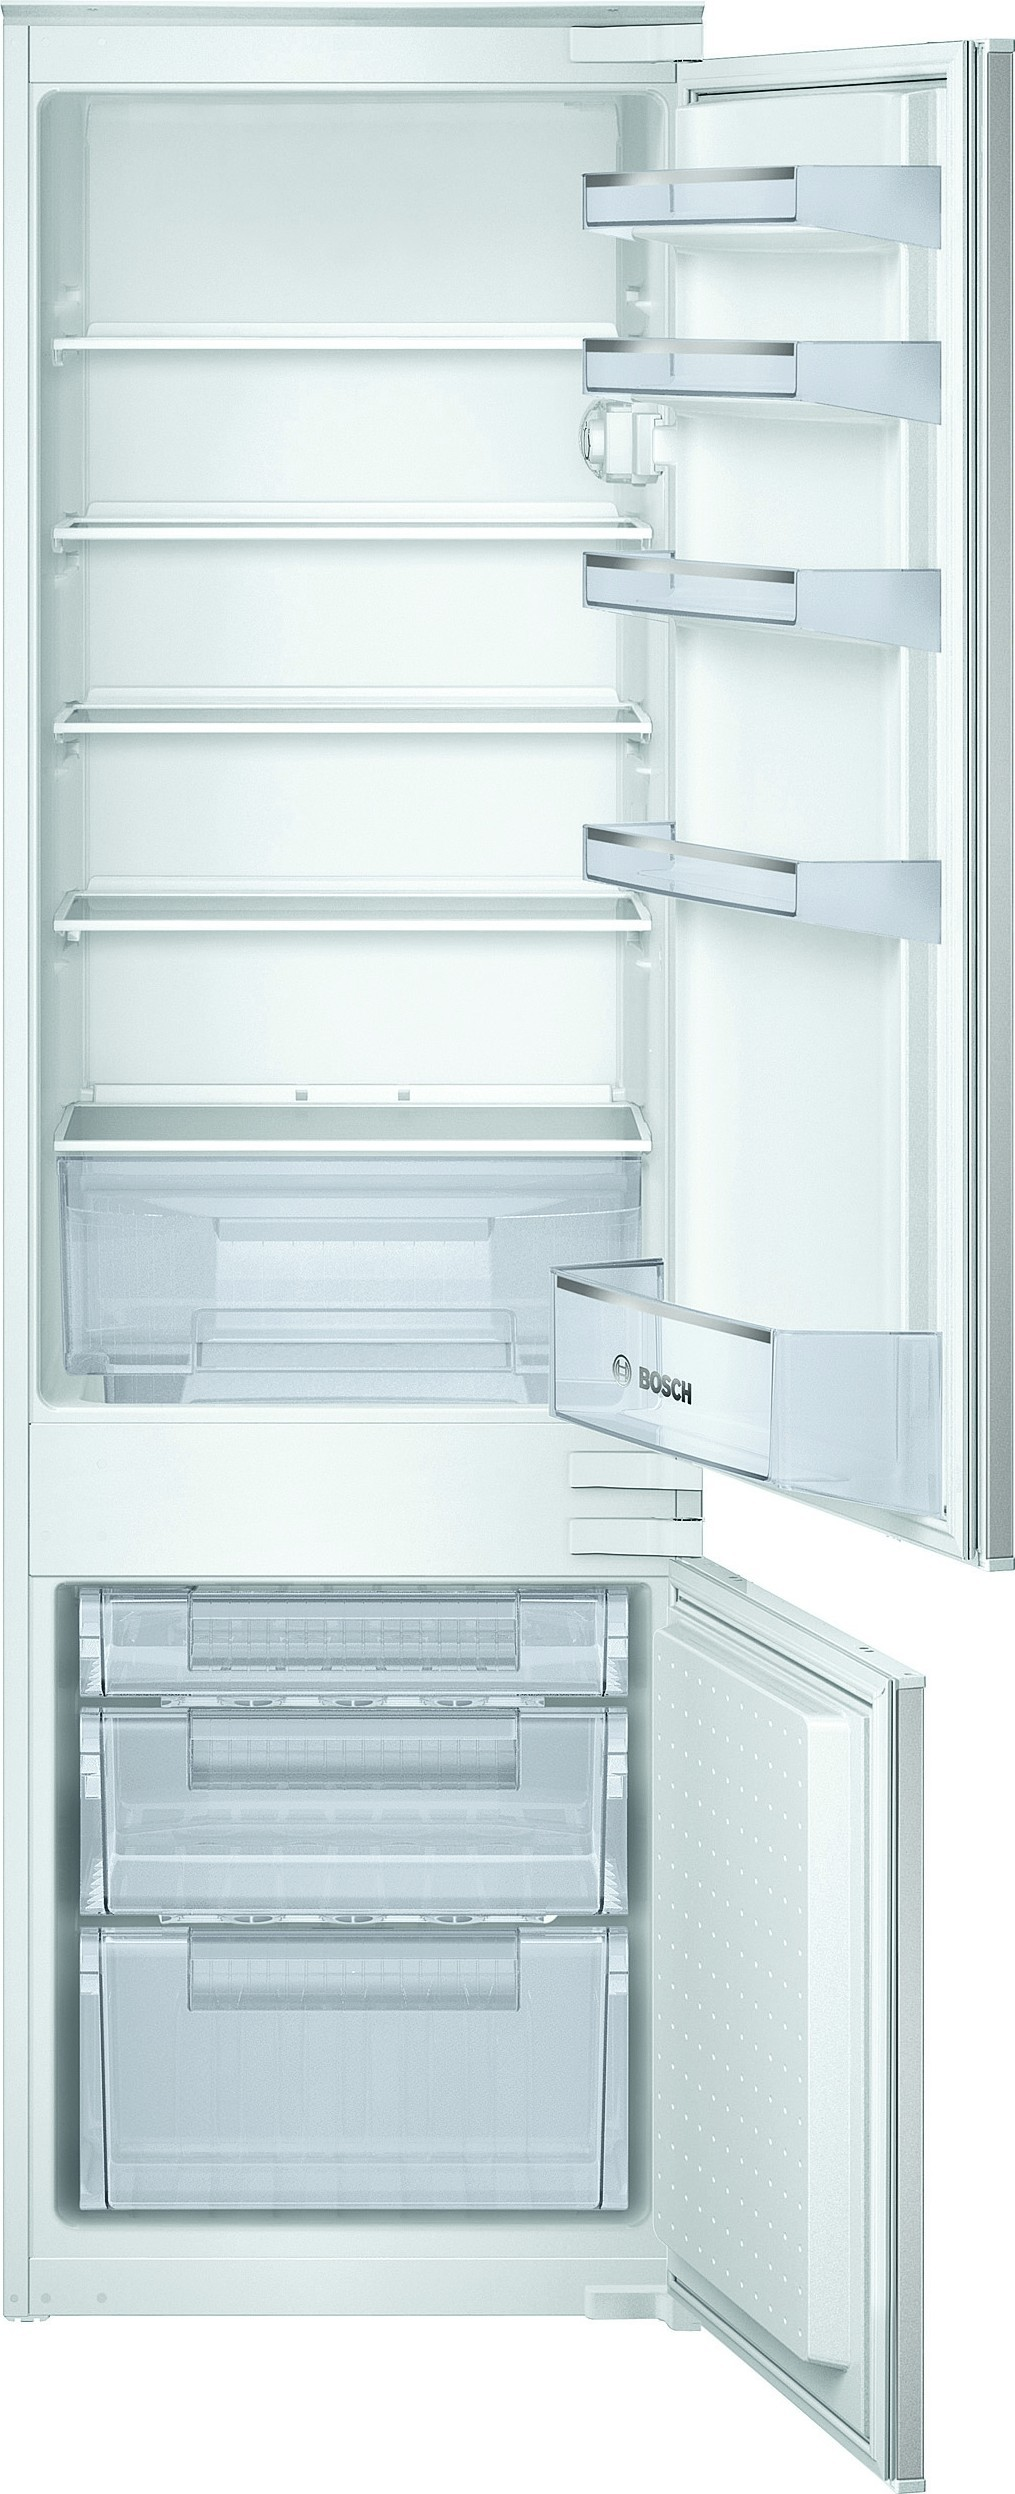 Bosch KIV38V20FF inbouw koelkast